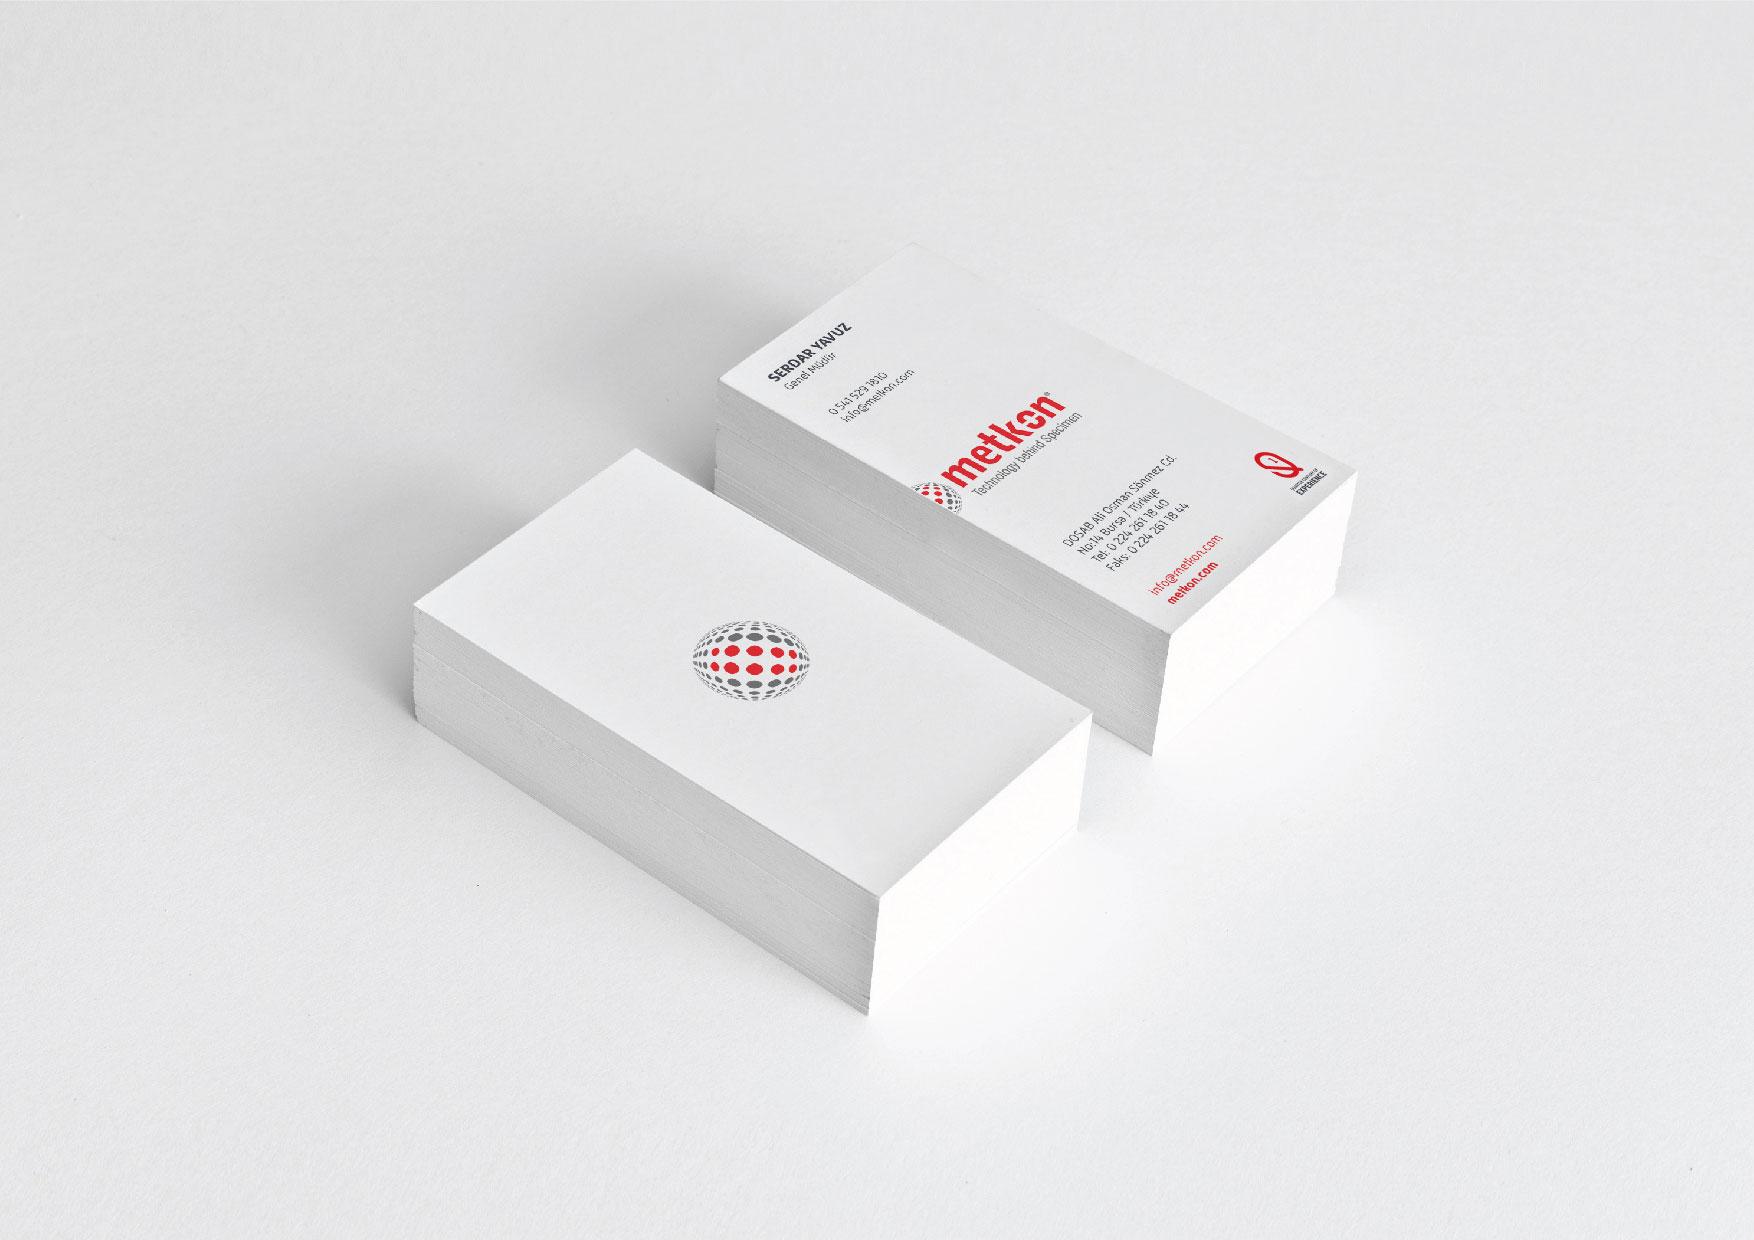 METKON-Q1-CONCEPT-DEVELOPMENT-SUNUM_Artboard-27